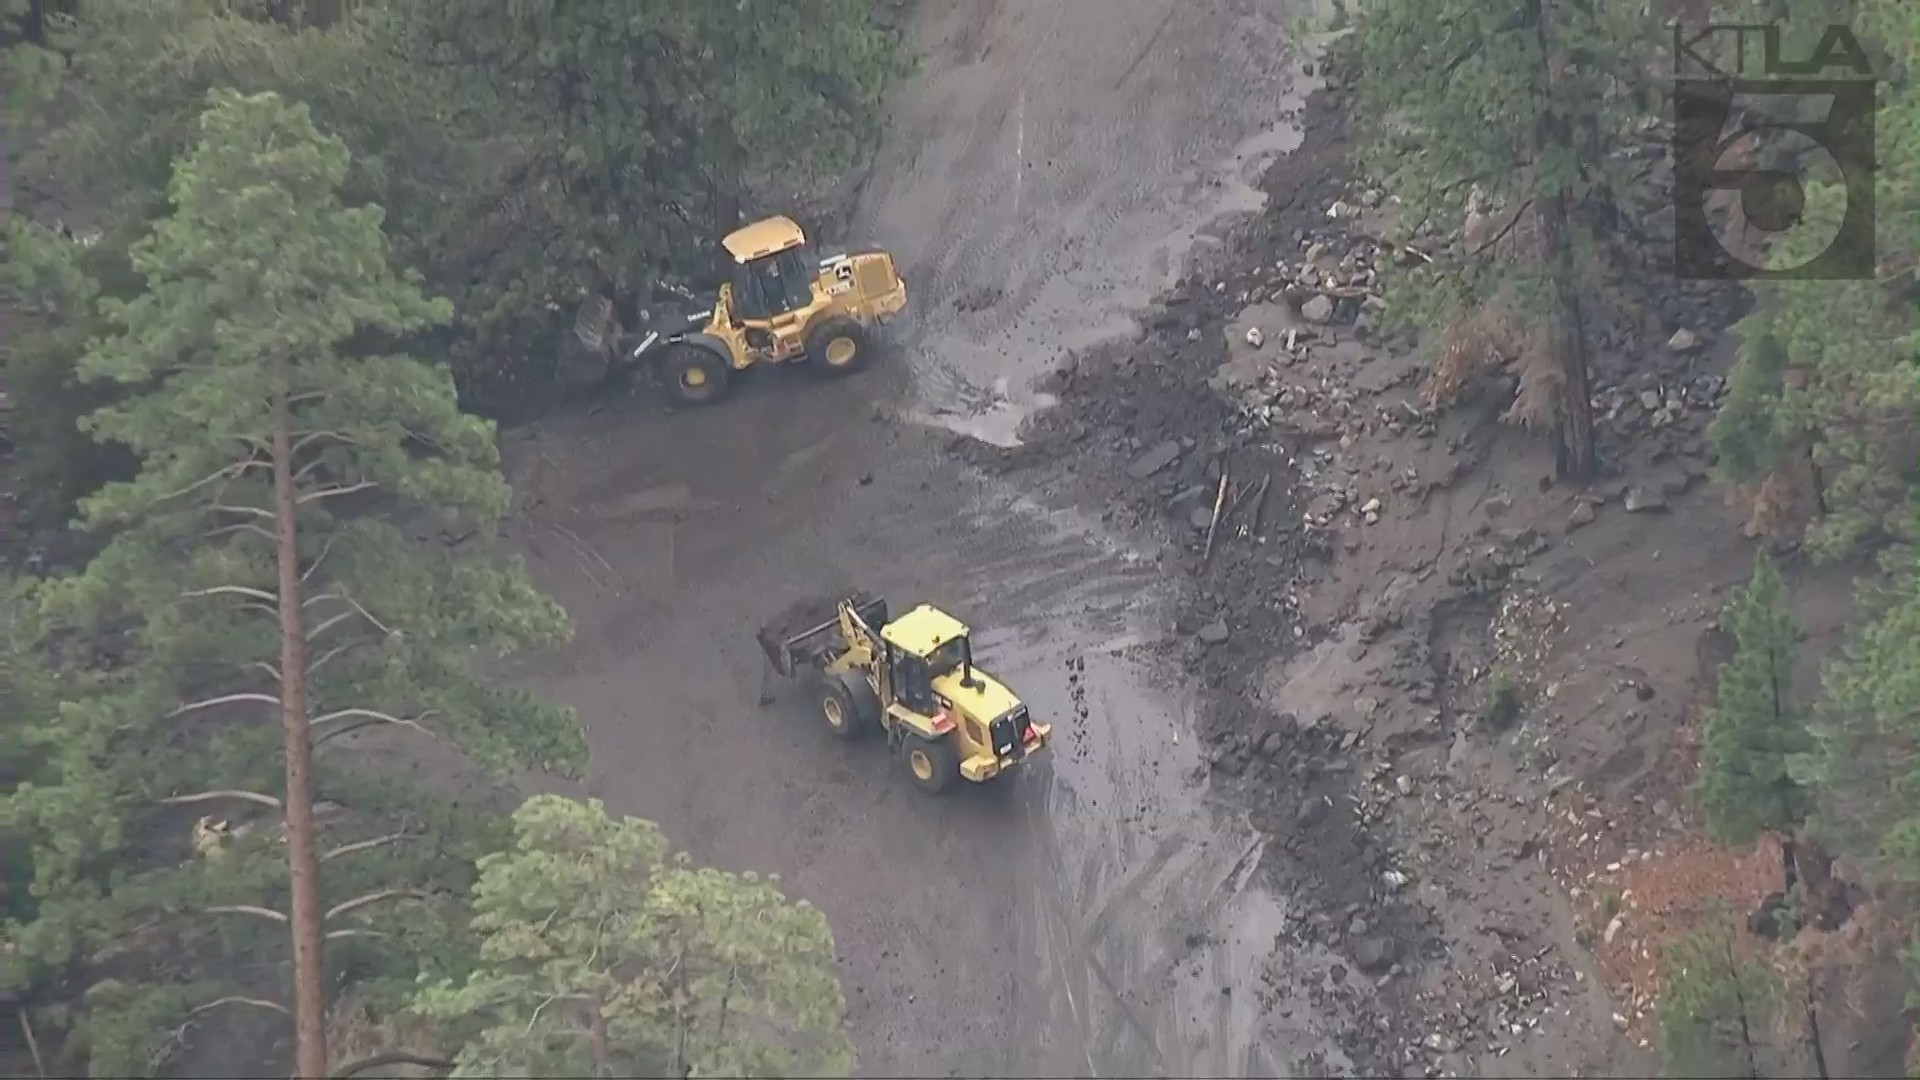 Caltrans crews work to clear mud flow along Highway 38 in Big Bear area on July 30, 2021. (KTLA)